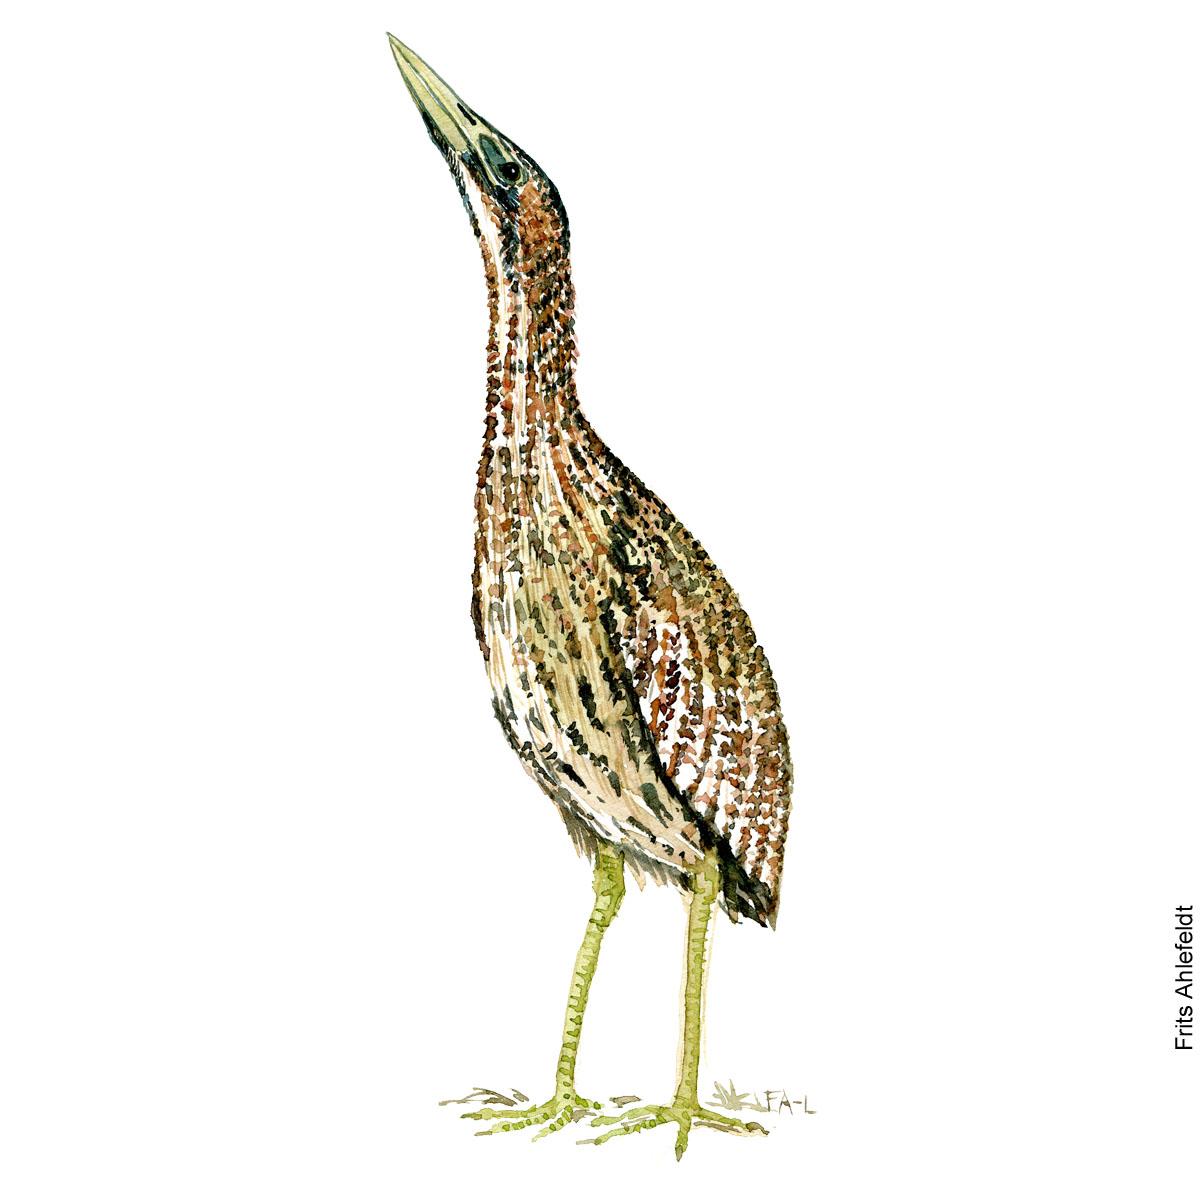 Northern bittern Bird watercolor illustration handmade by Frits Ahlefeldt